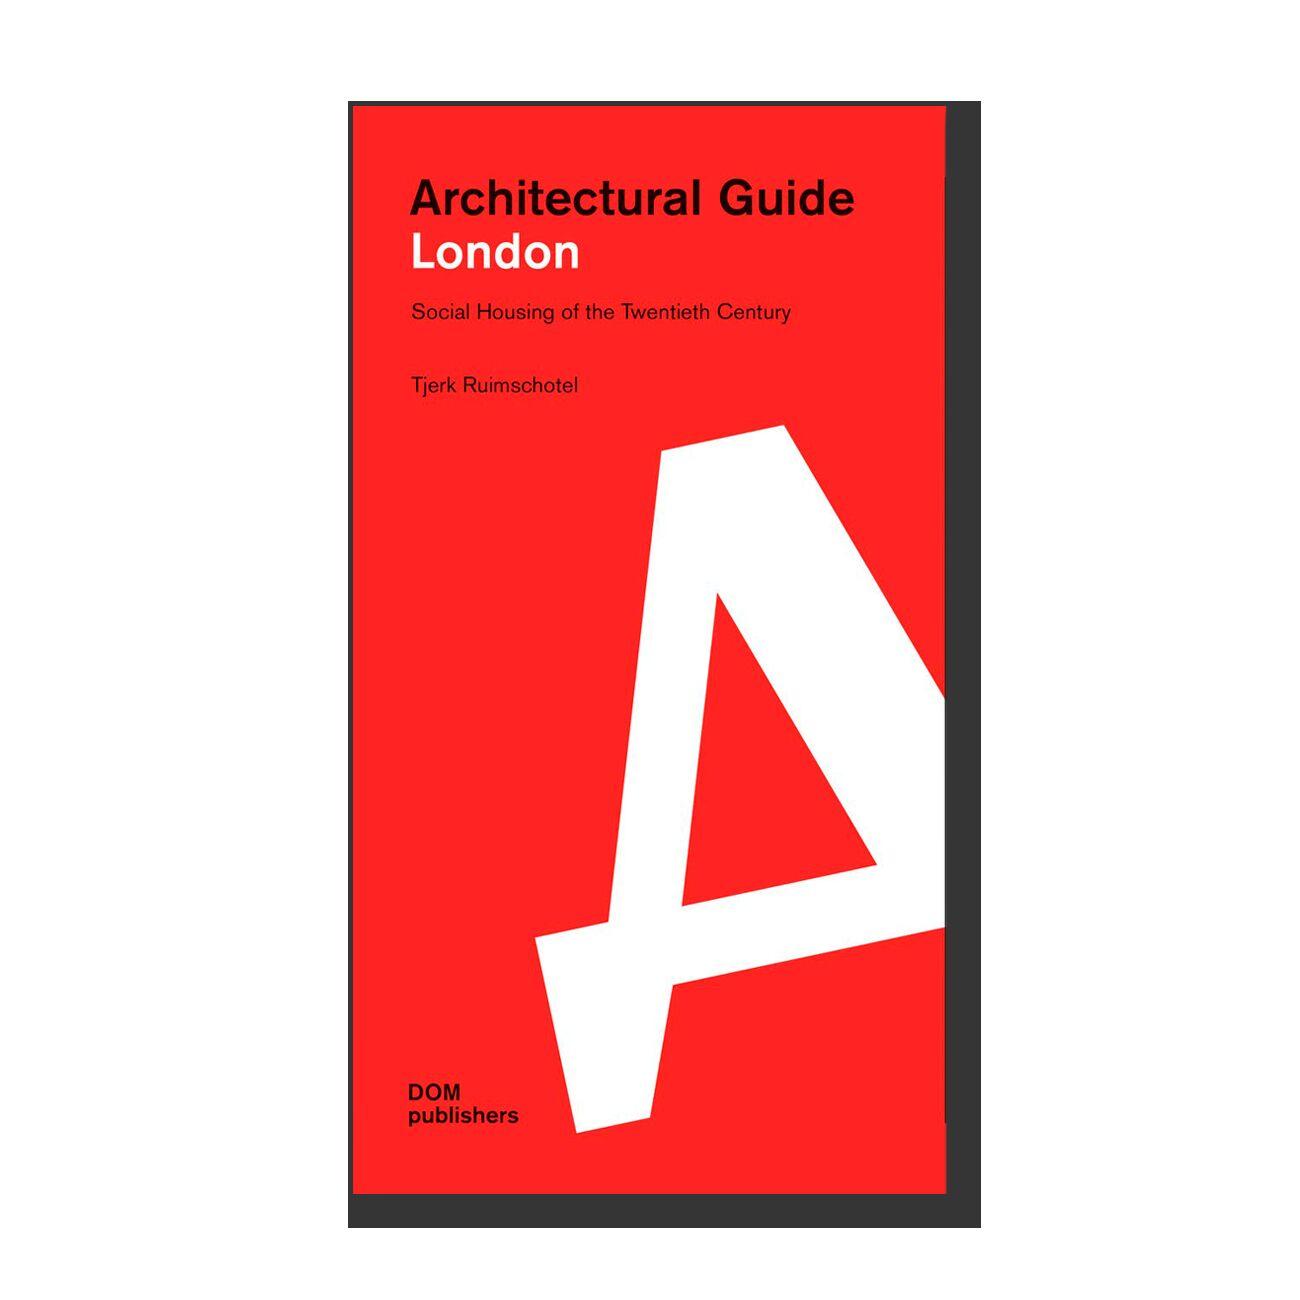 Architectural Guide London